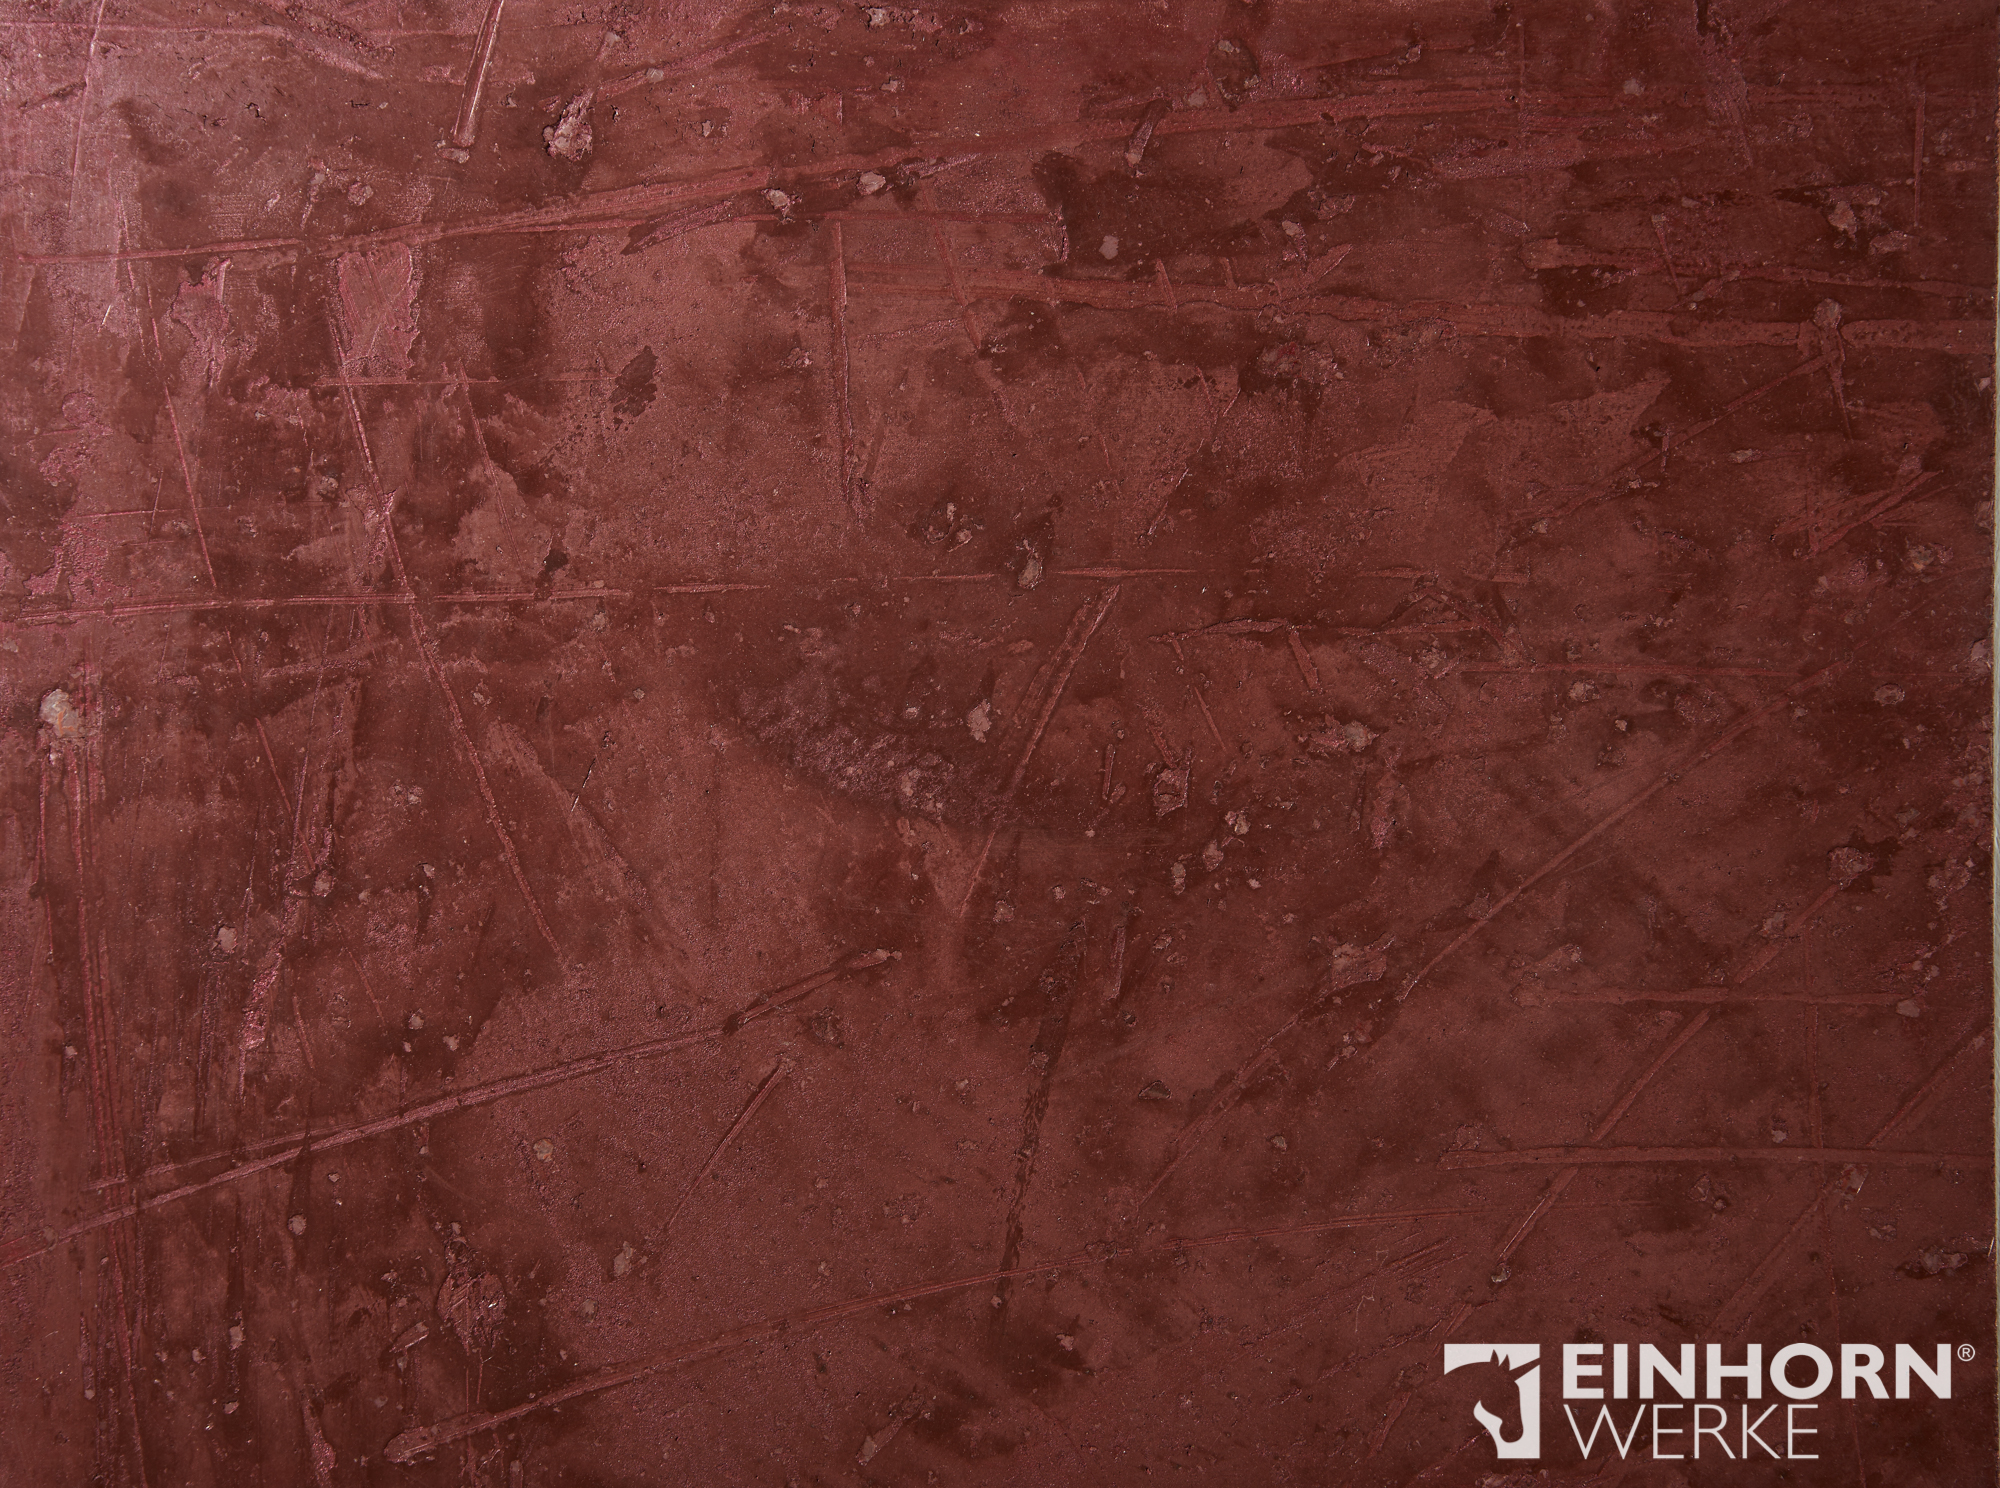 STUCCORINO 1306 + Perlglimmer grob + STUCCORINO Fresco - 1306 + STUCCORINO Effect - Rubin - edle Wandgestaltungen aus Marmoputz von EINHORN WERKE